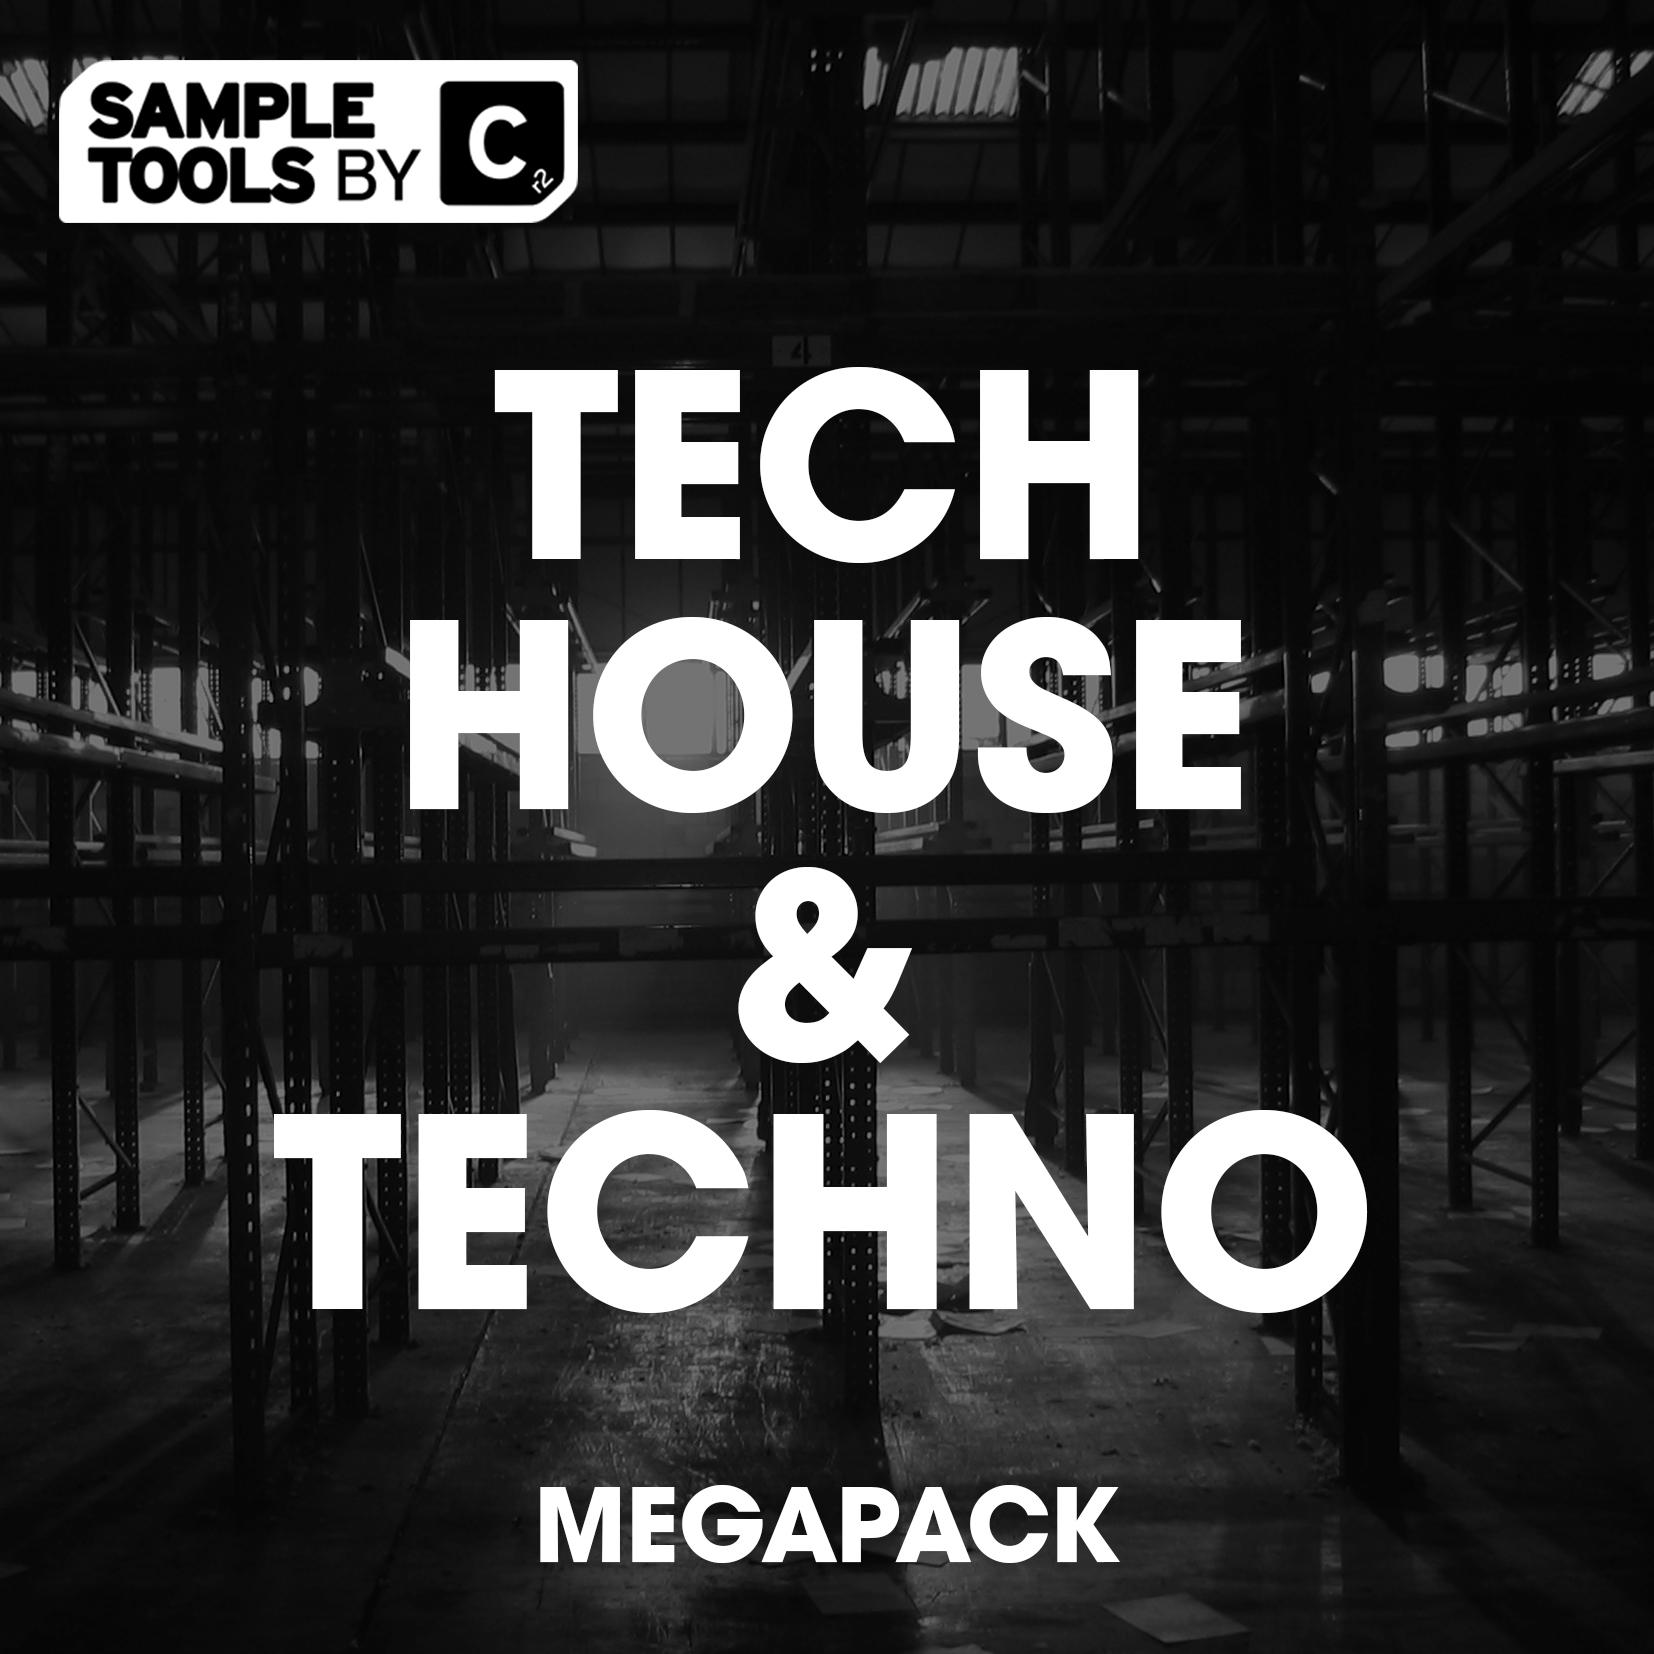 Tech House & Techno Megapack